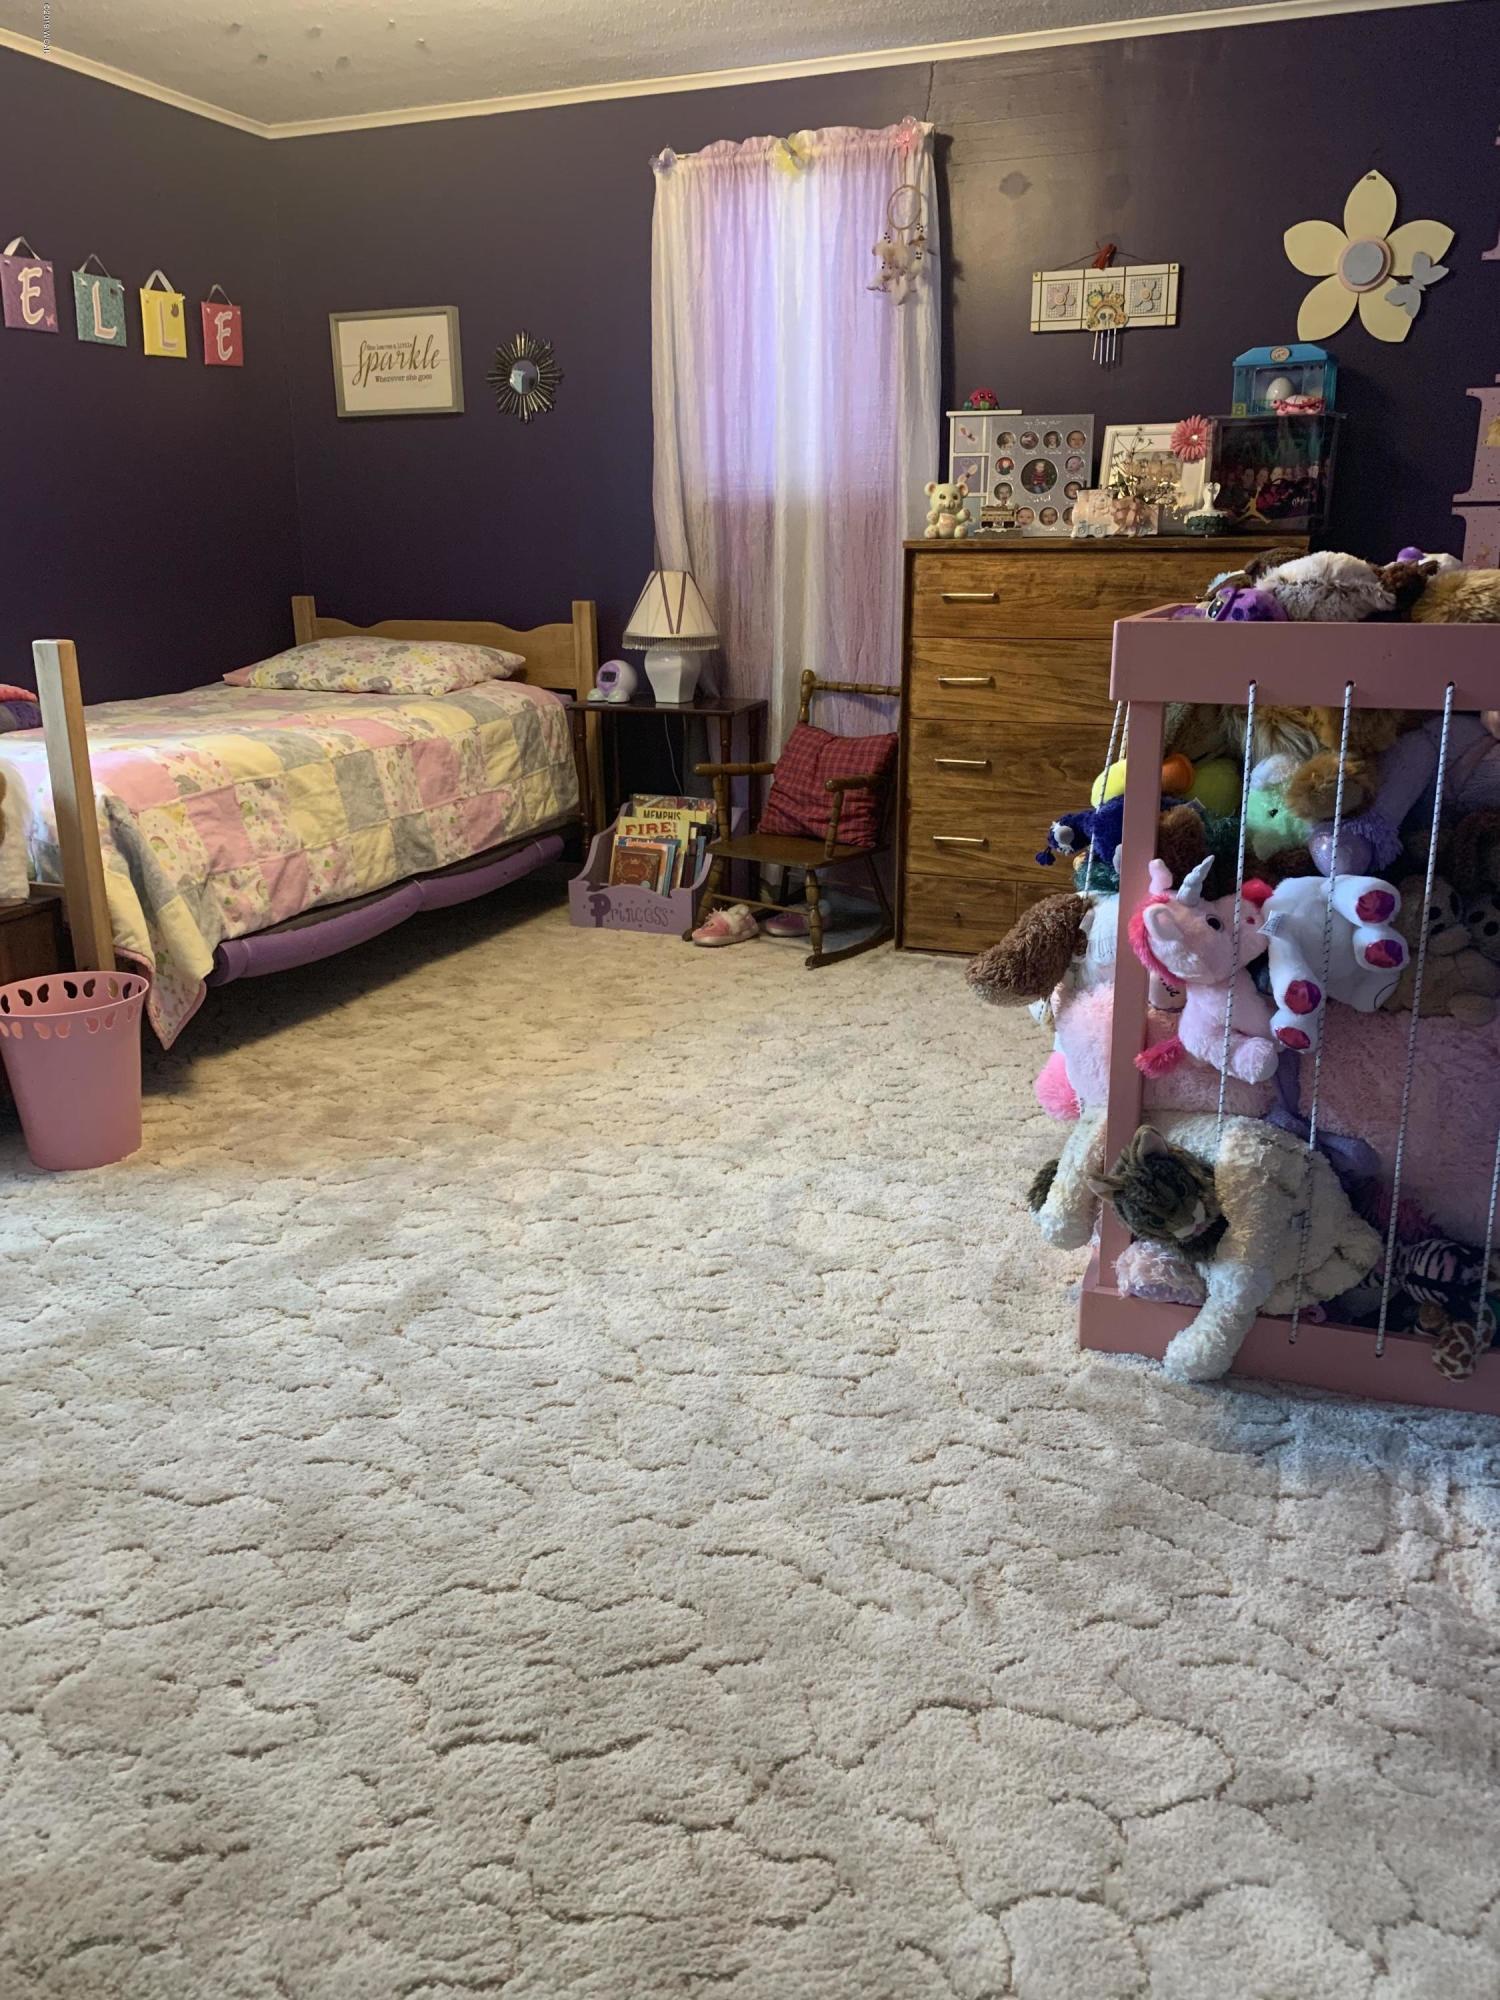 1304 9th Street,Willmar,5 Bedrooms Bedrooms,3 BathroomsBathrooms,Single Family,9th Street,6033438